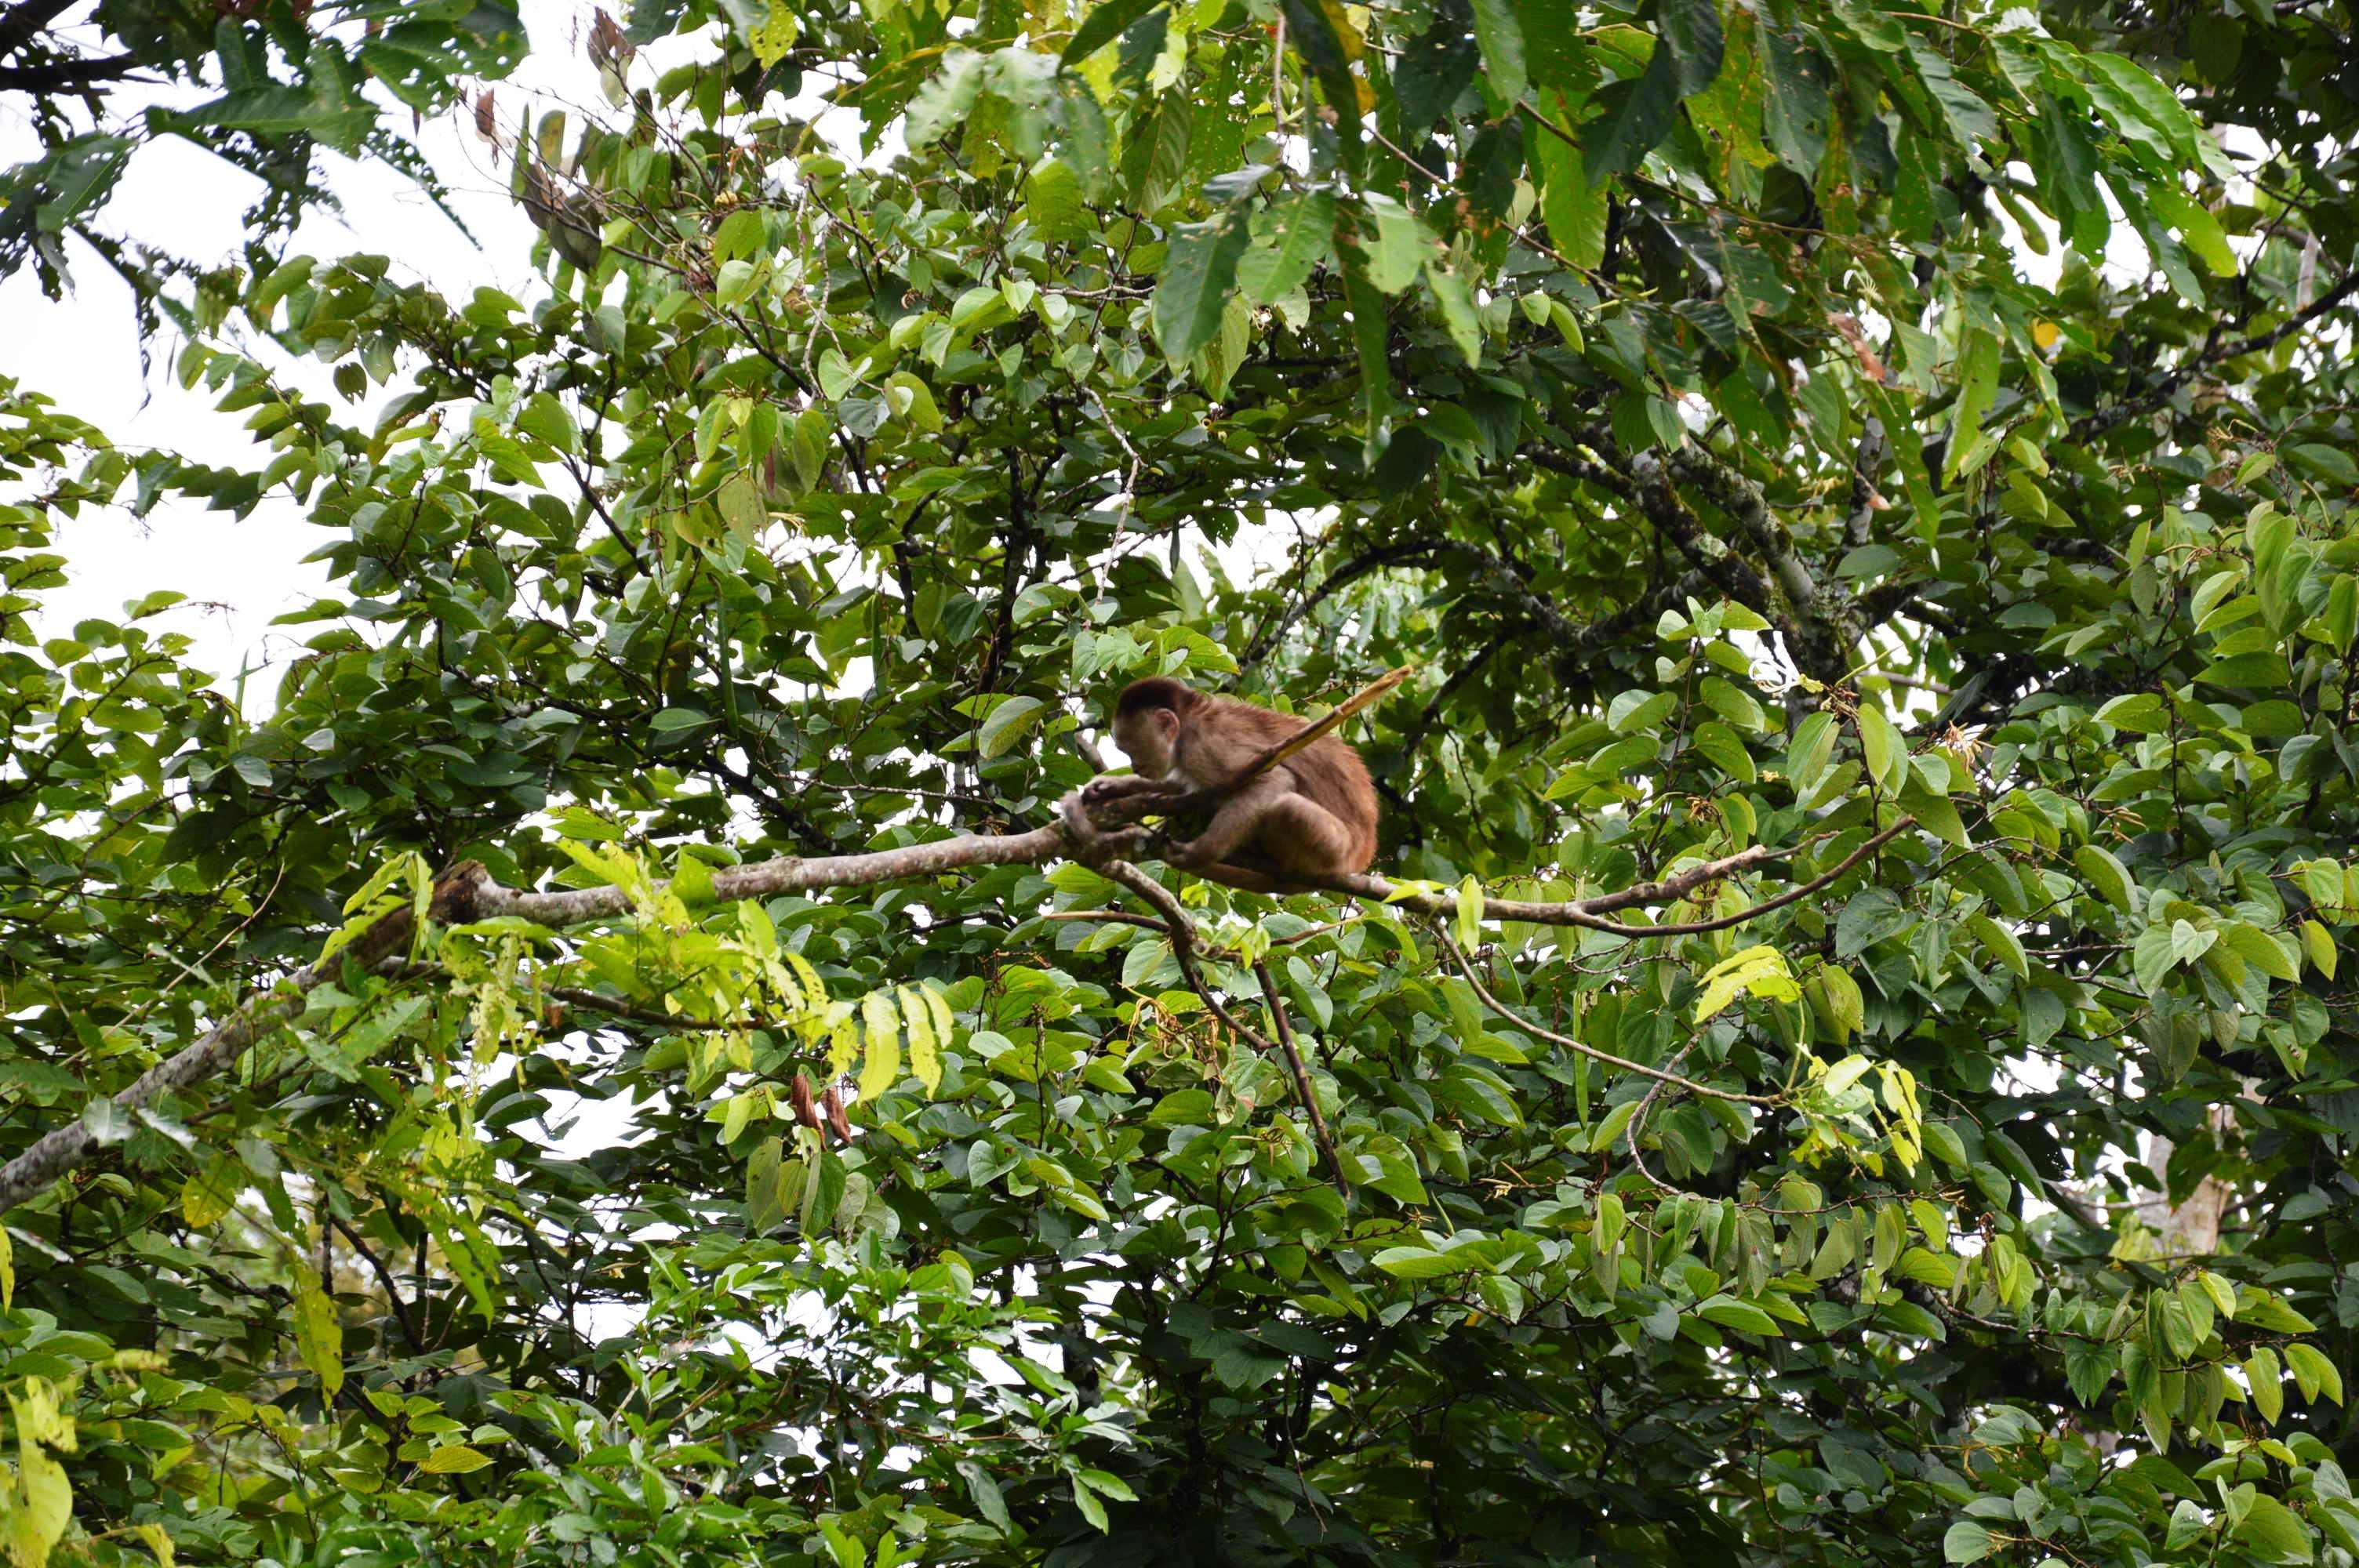 singe dans la foret amazonienne